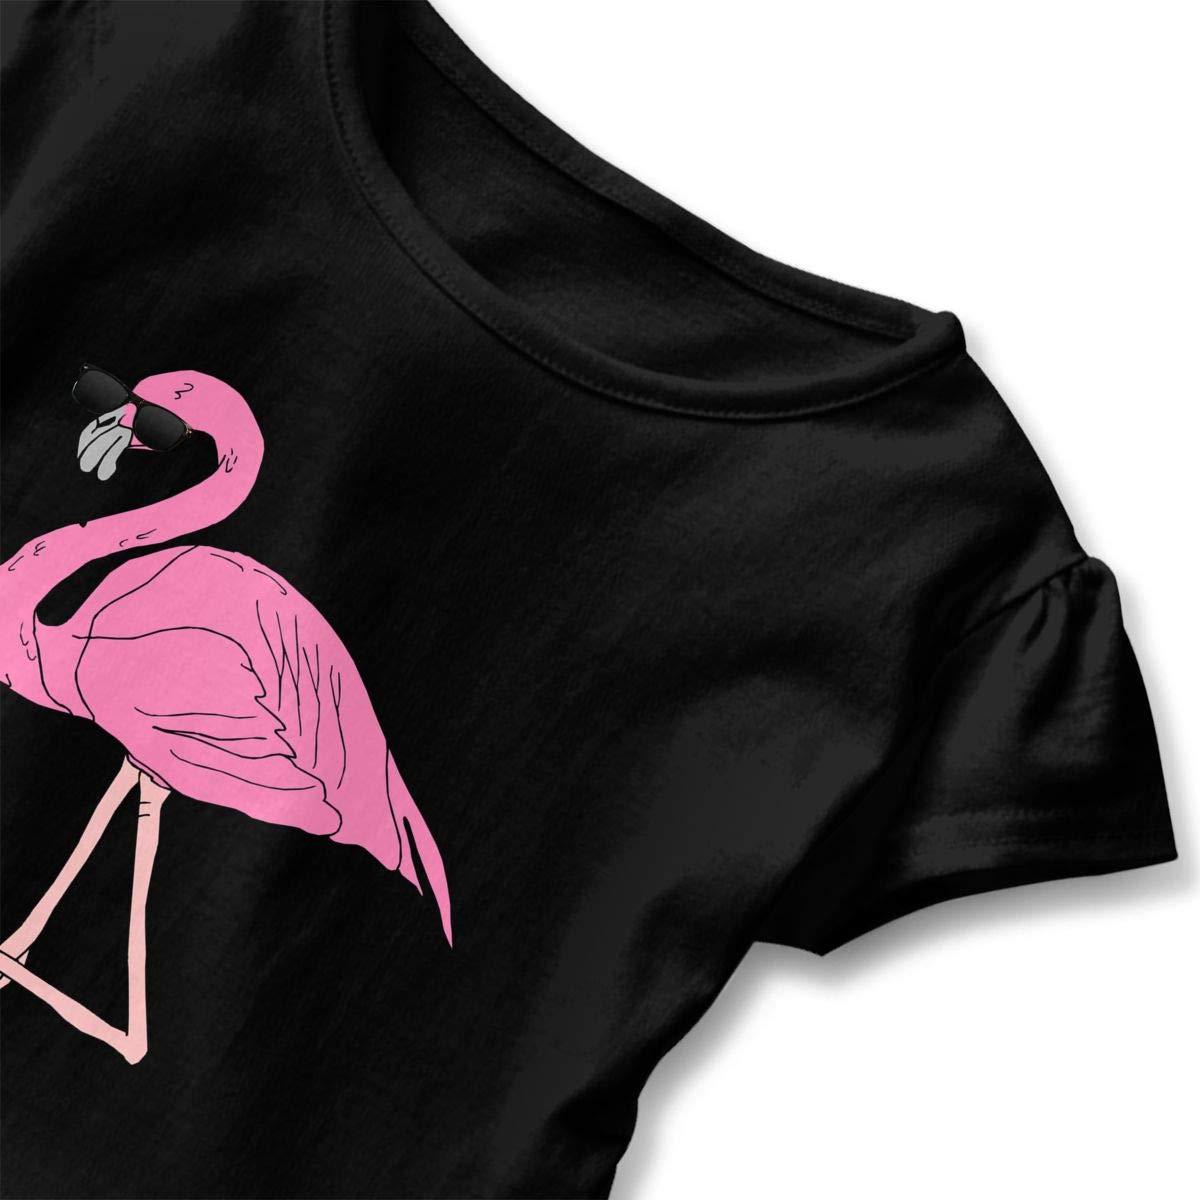 Cool Pink Flamingo Toddler Baby Girls Cotton Ruffle Short Sleeve Top Comfortable T-Shirt 2-6T